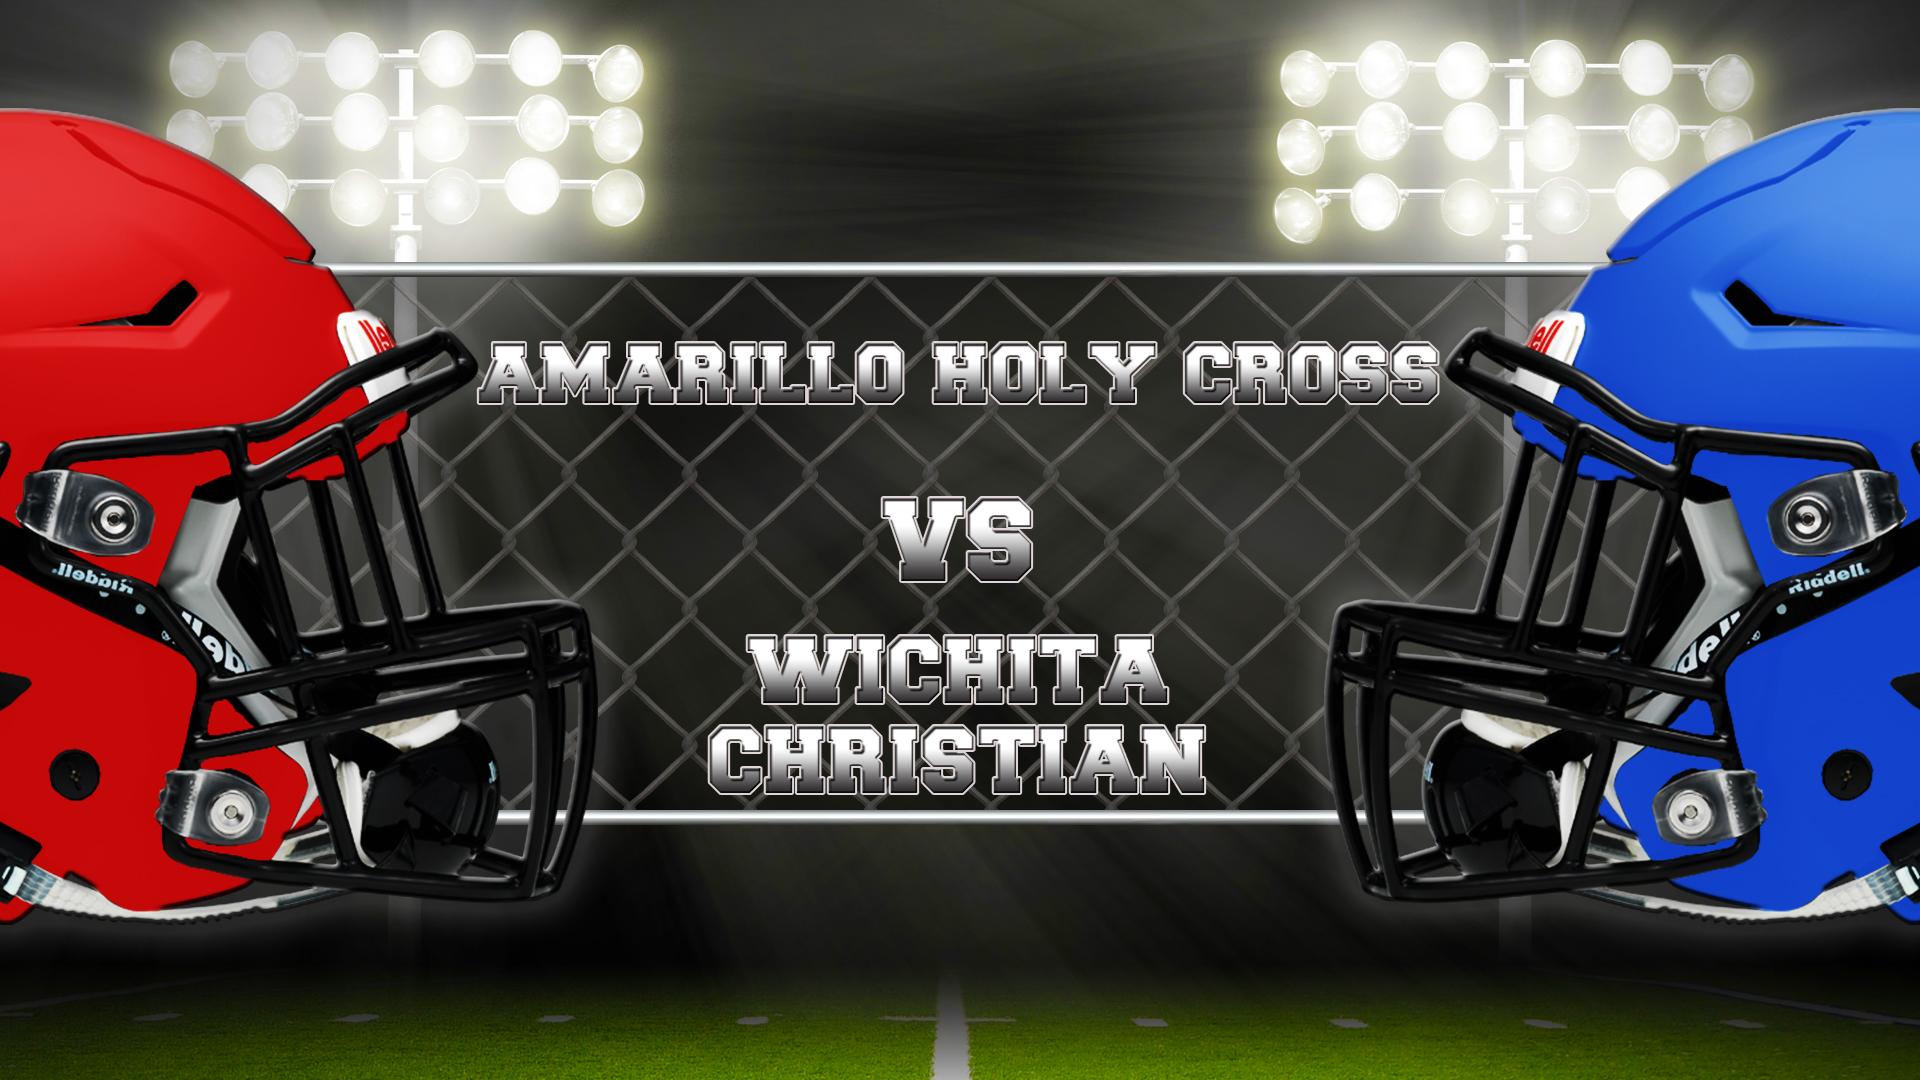 Amarillo Holy Cross vs Wichita Christian_1475768073354.jpg